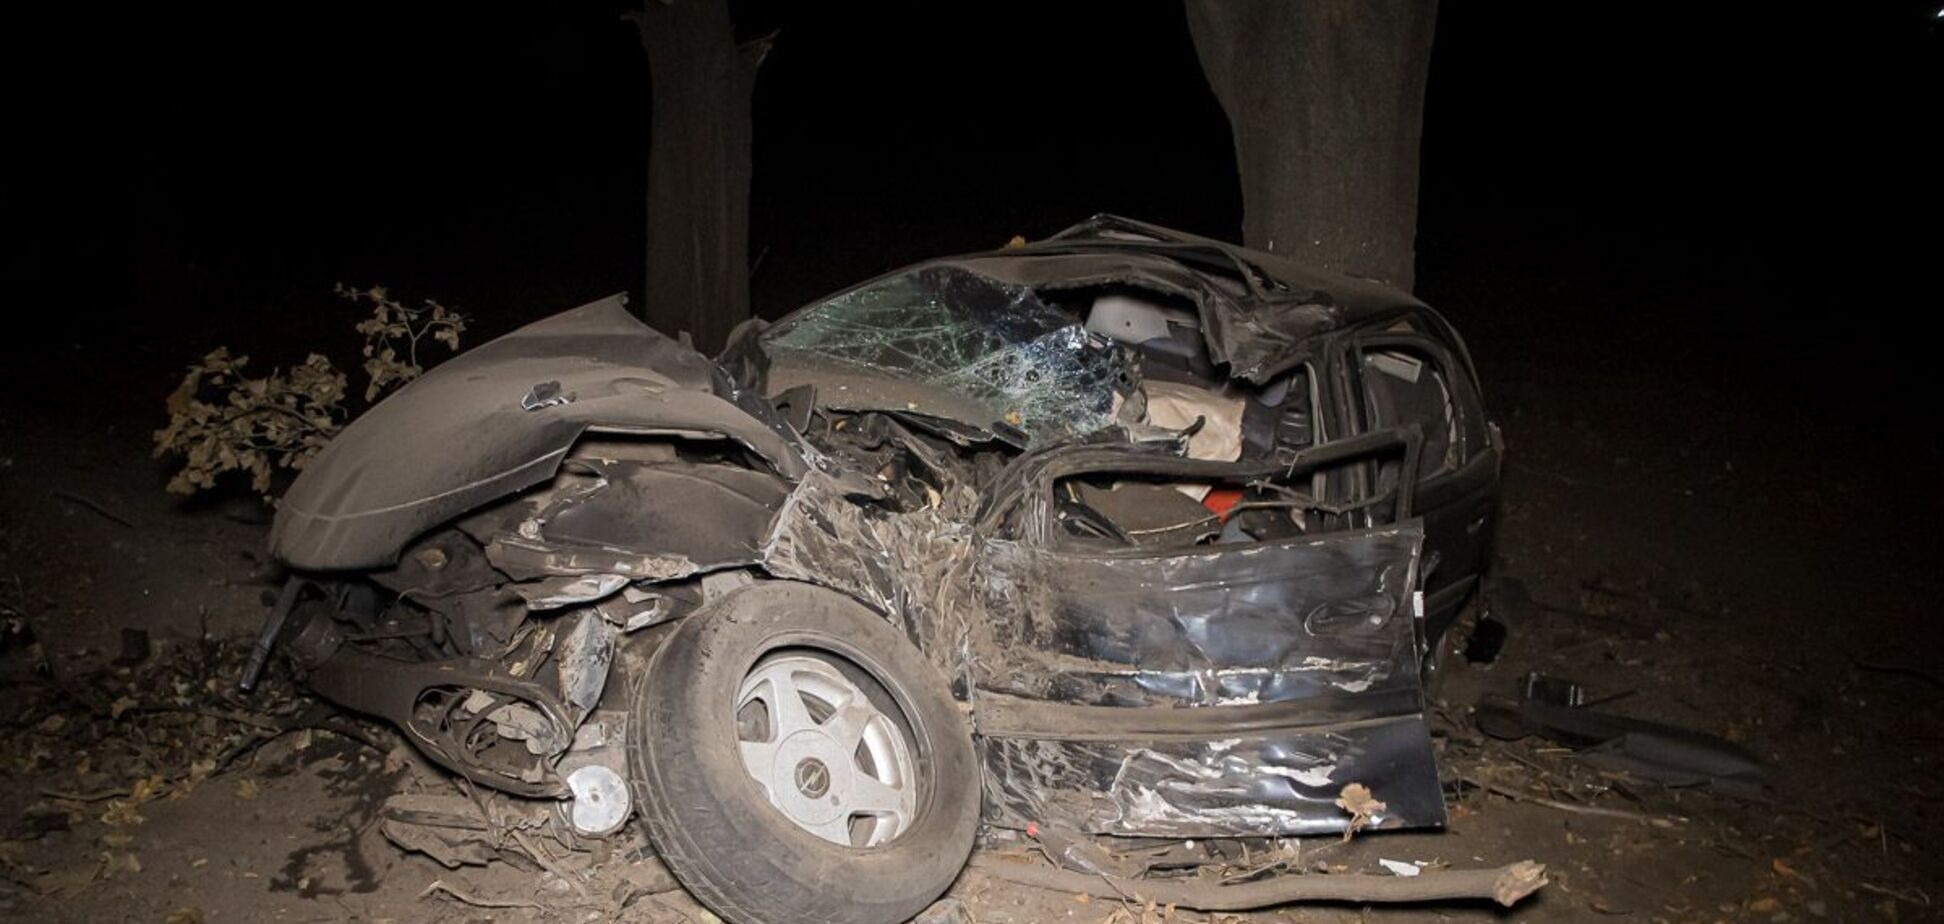 На Днепропетровщине авто врезалось в дерево, водитель погиб. Фото